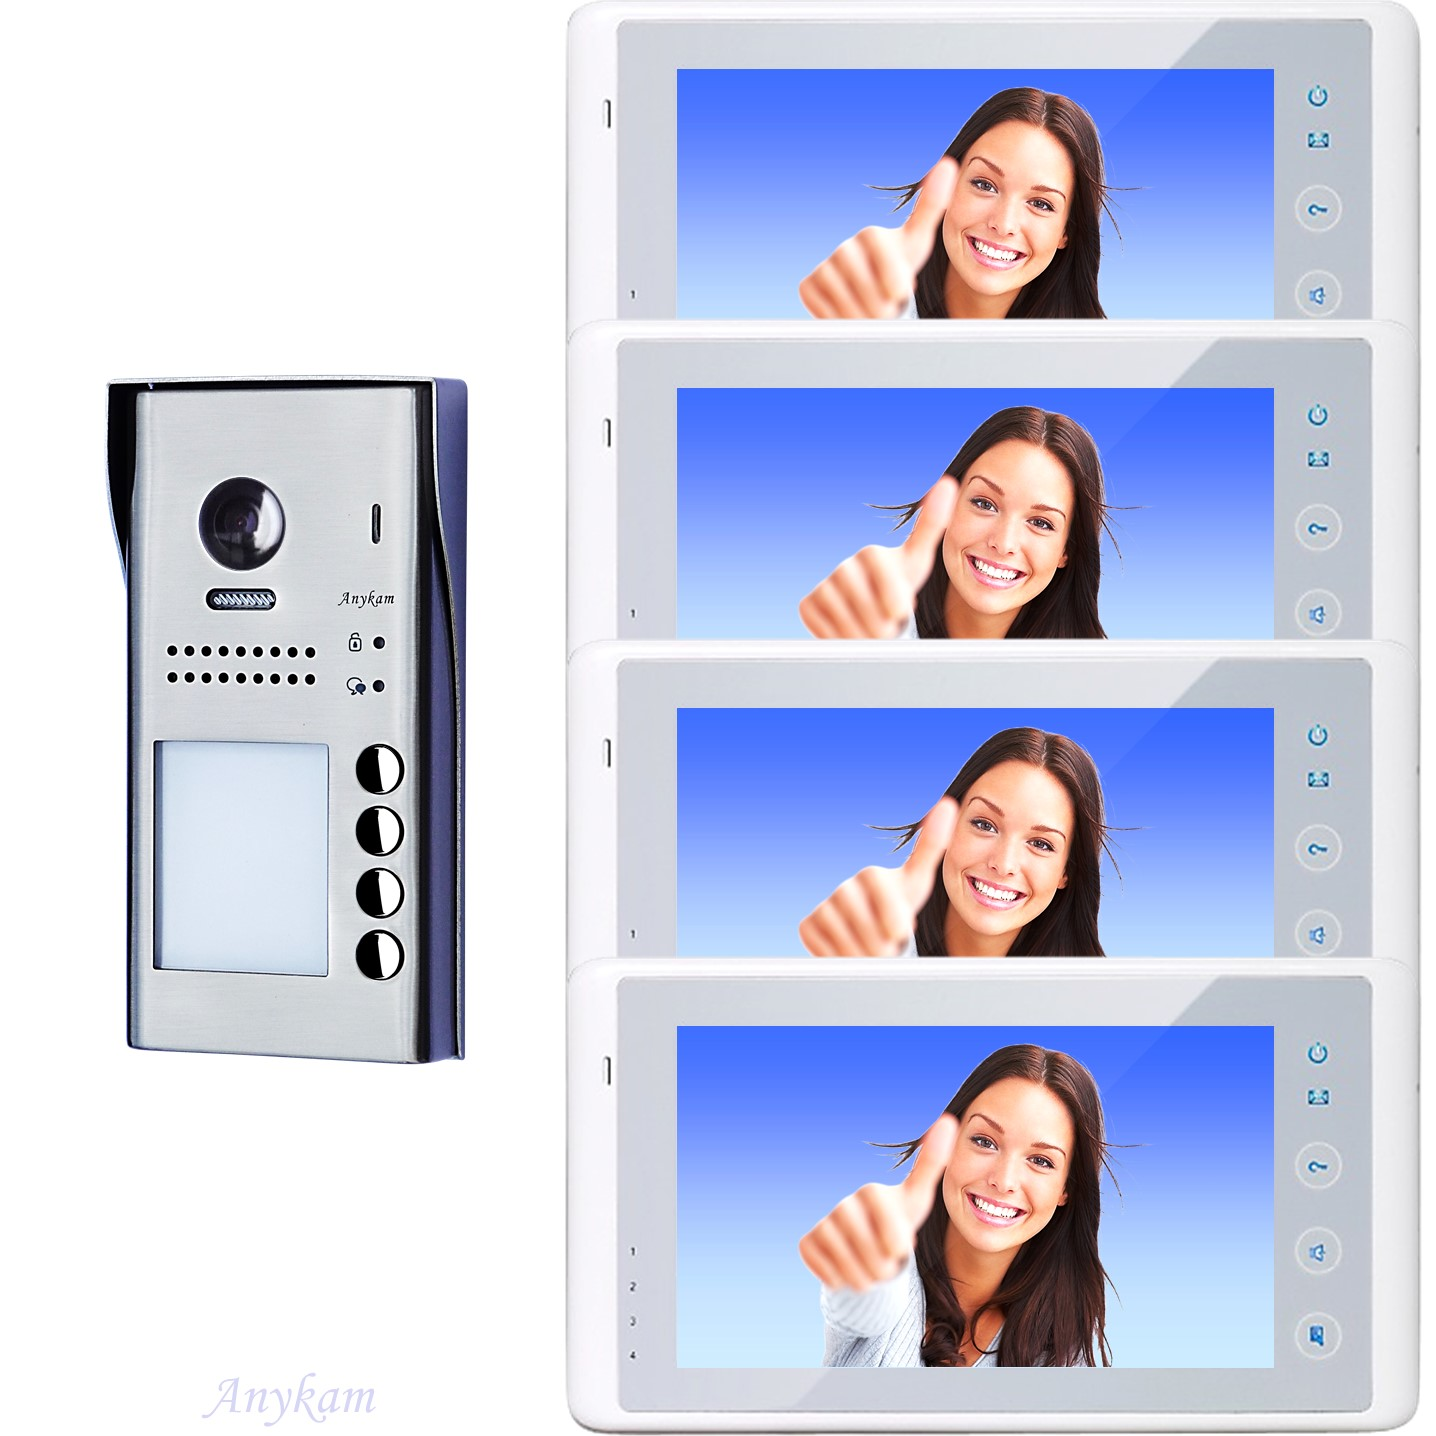 607idfes4 4x 27w video t rsprechanlage videosprechanlage 4 familienhaus 2draht. Black Bedroom Furniture Sets. Home Design Ideas